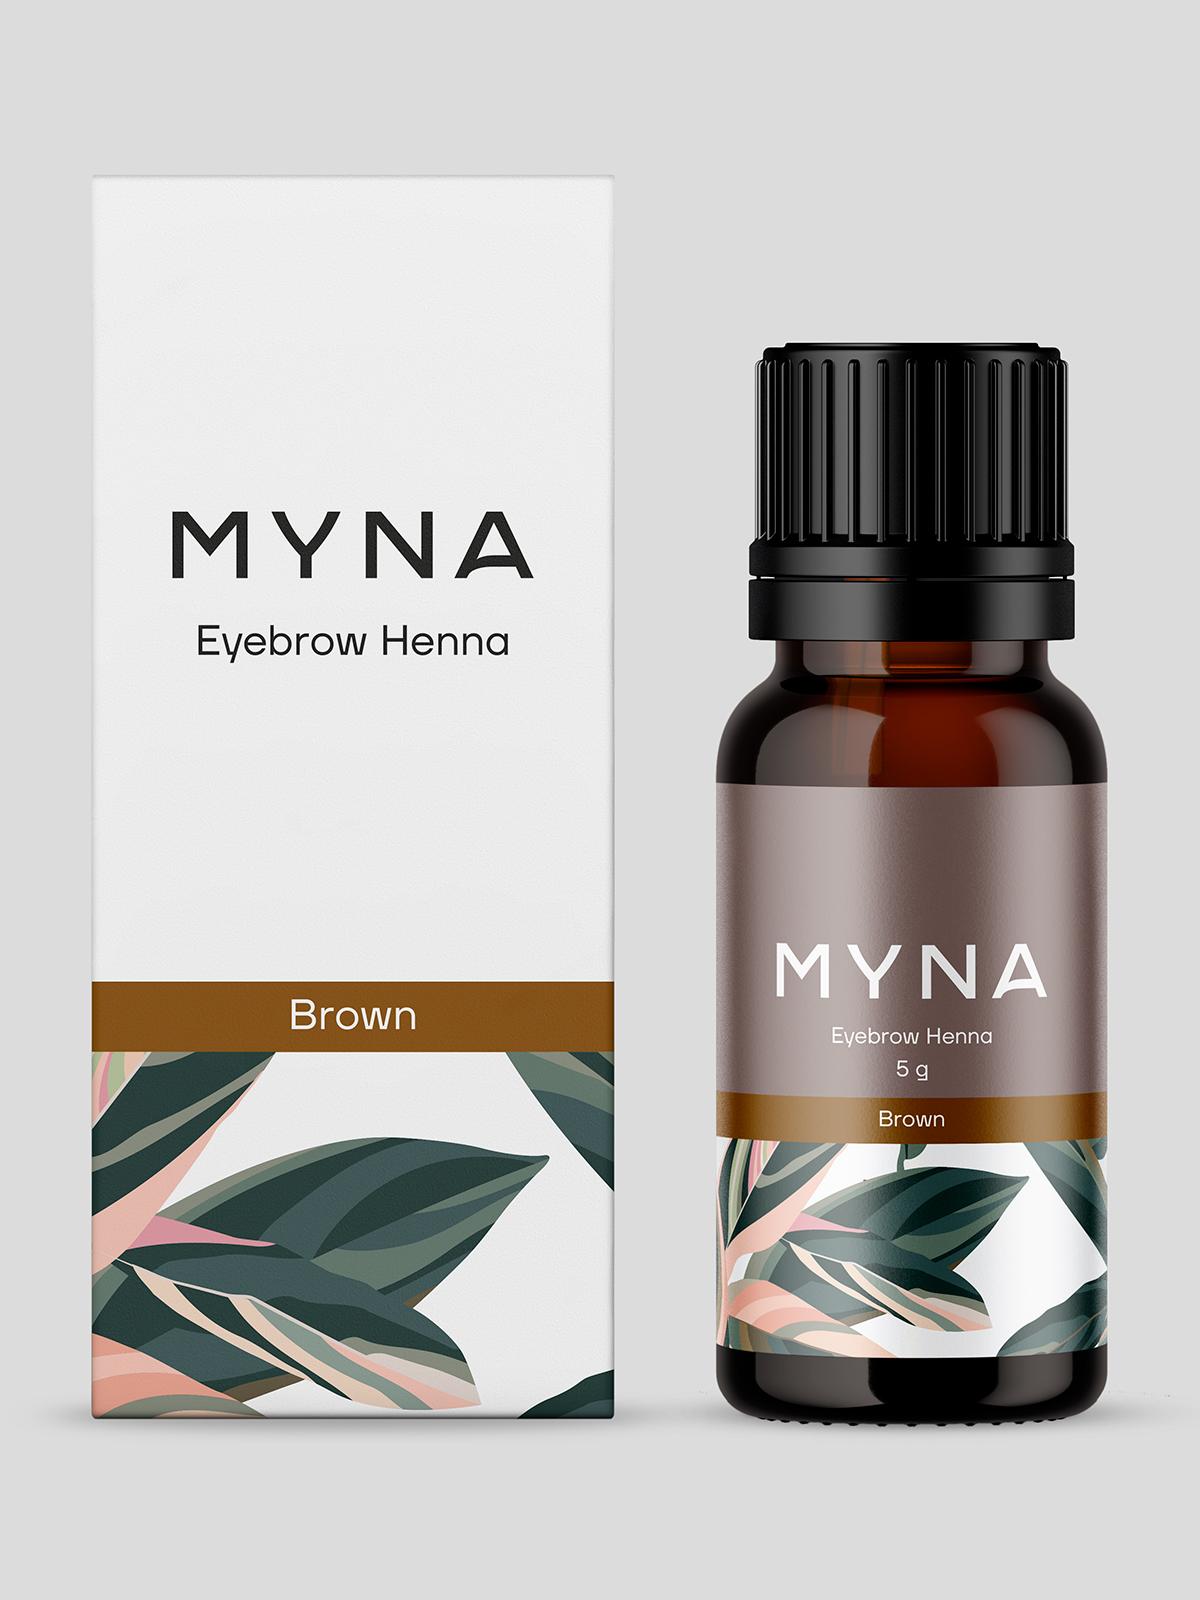 Myna-Henna-Golden_Brown-Visual-Myna-Henna-Brown-Visual-1200x1600px